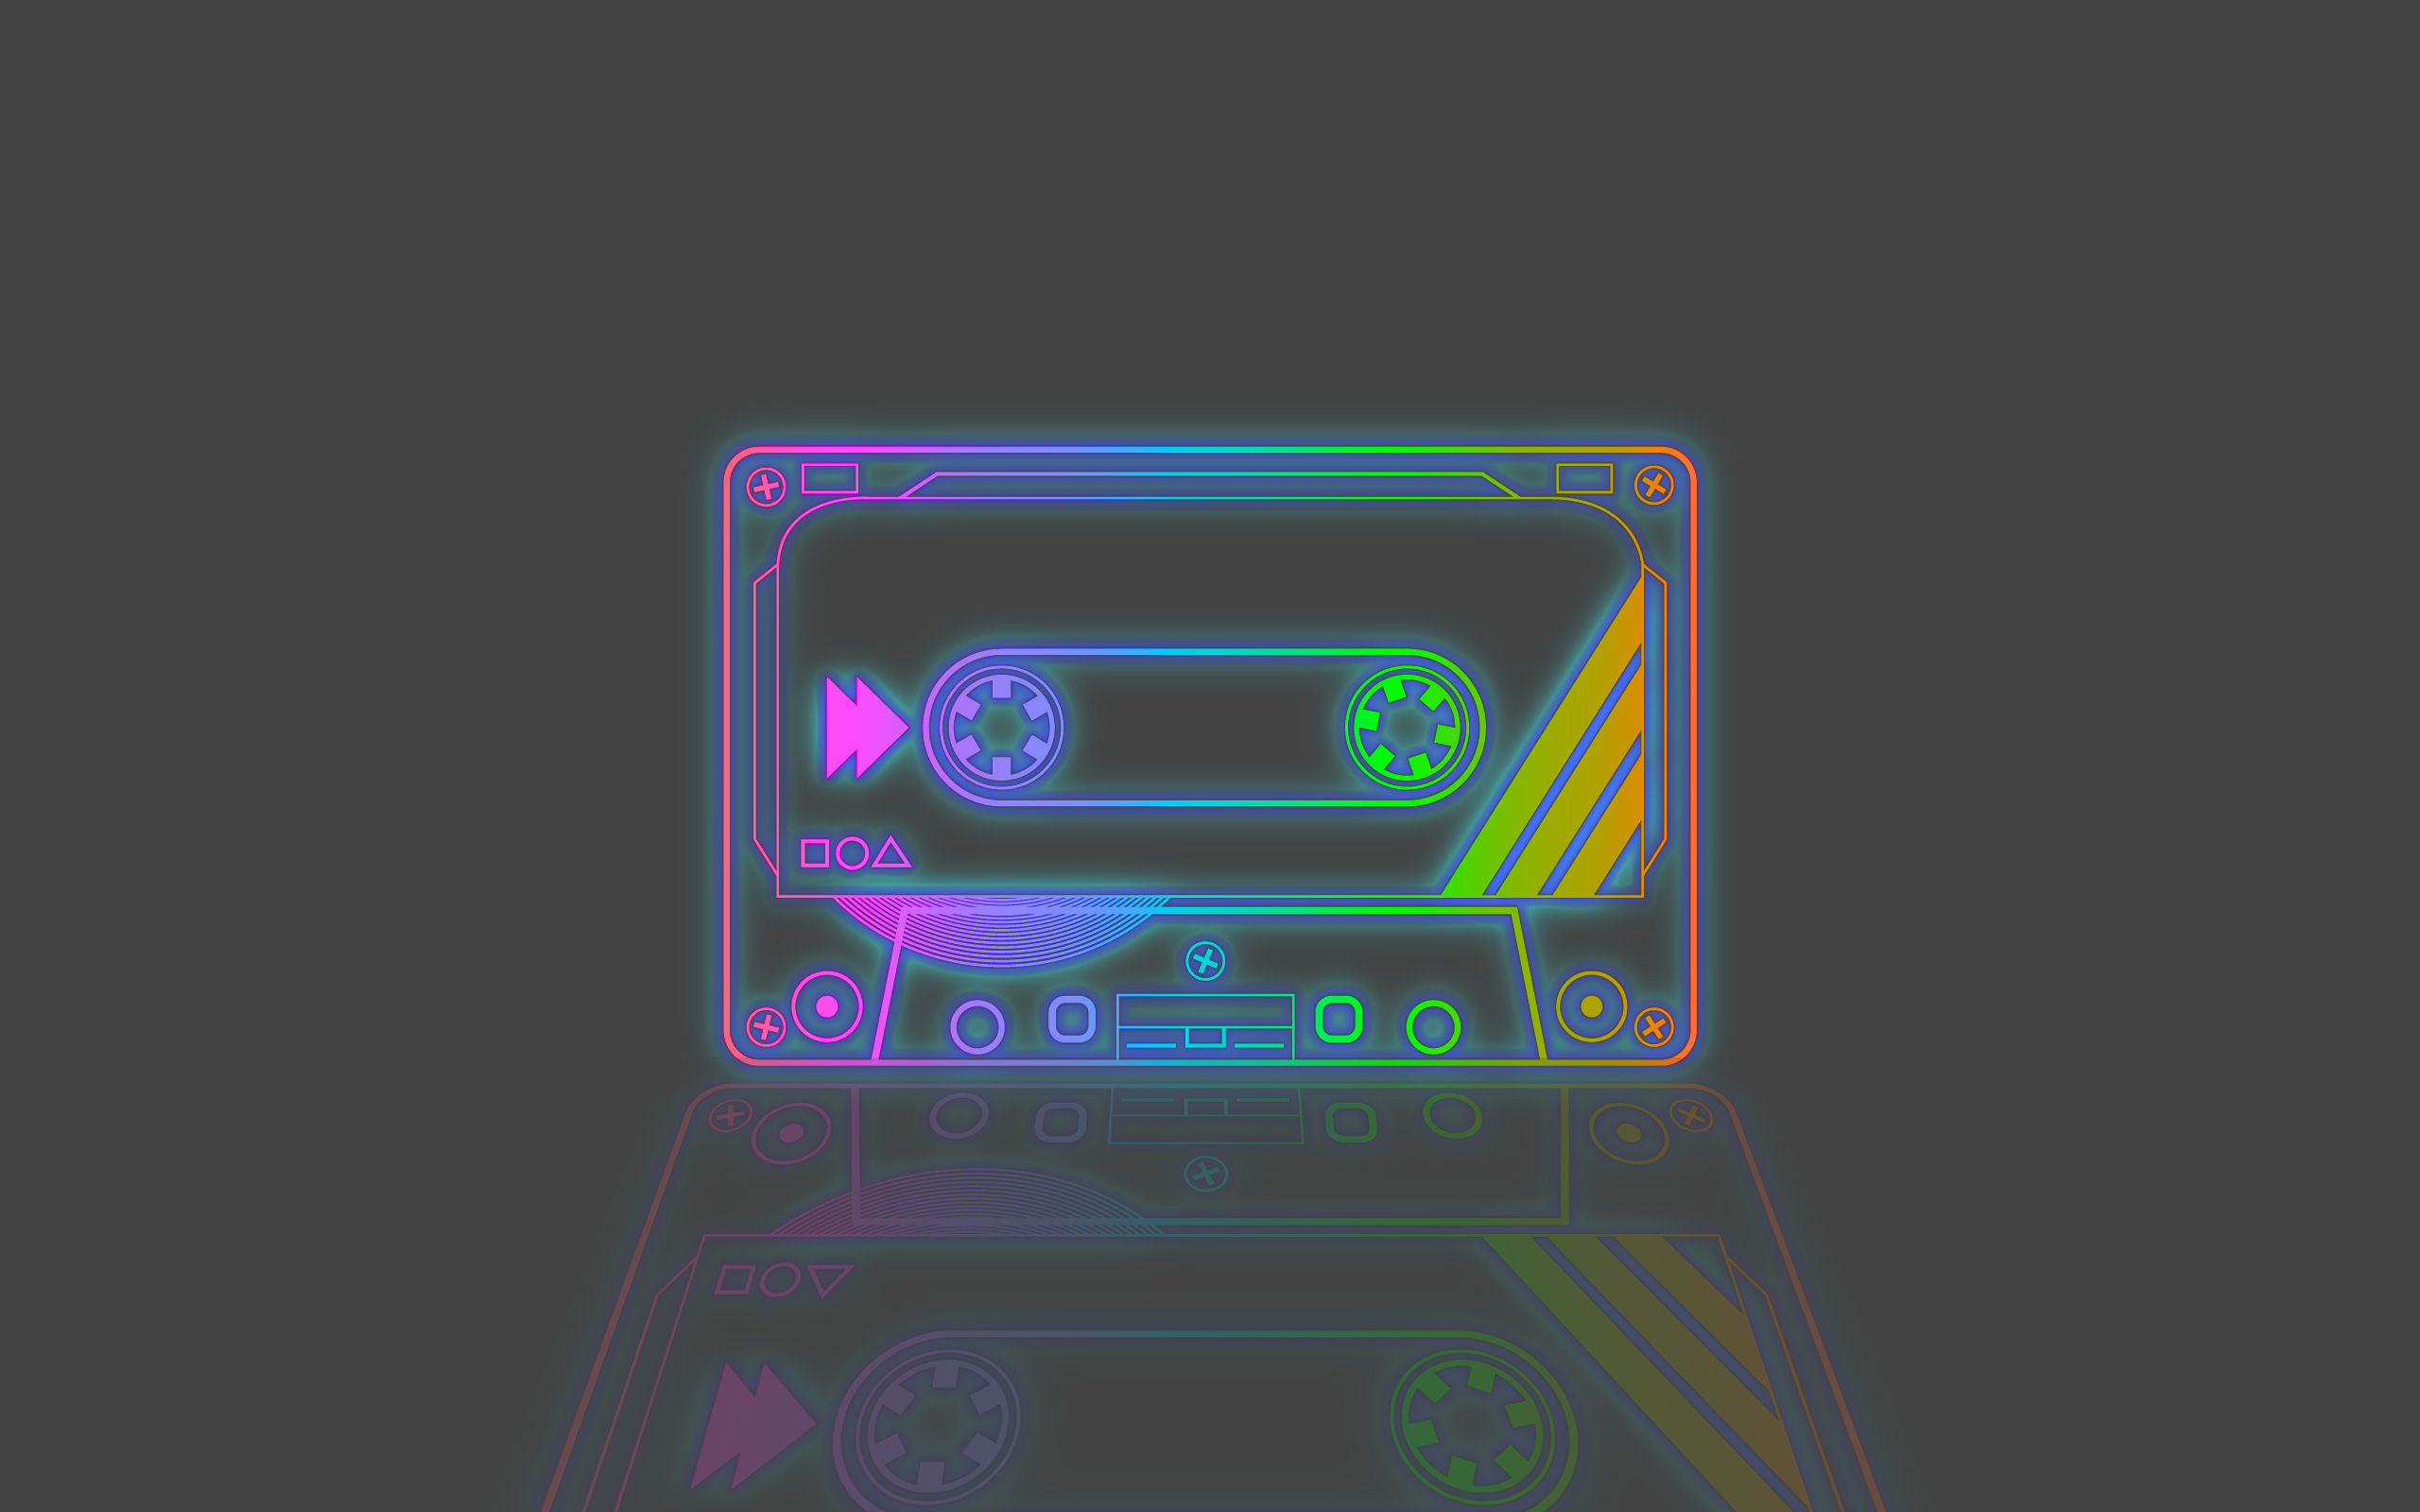 Vintage Iphone Wallpaper Cassette Fondos De Pantalla Fondos De Escritorio